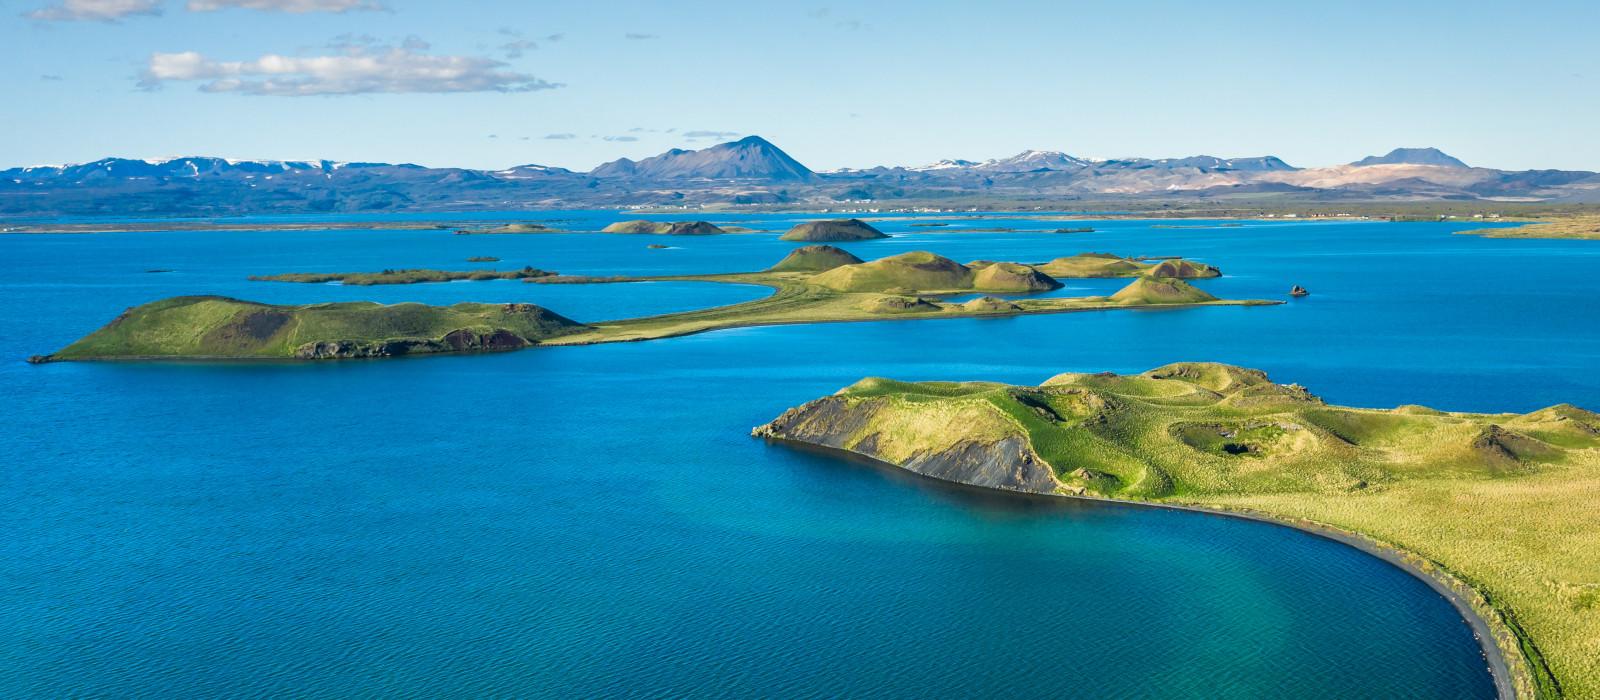 Destination Lake Mývatn Iceland